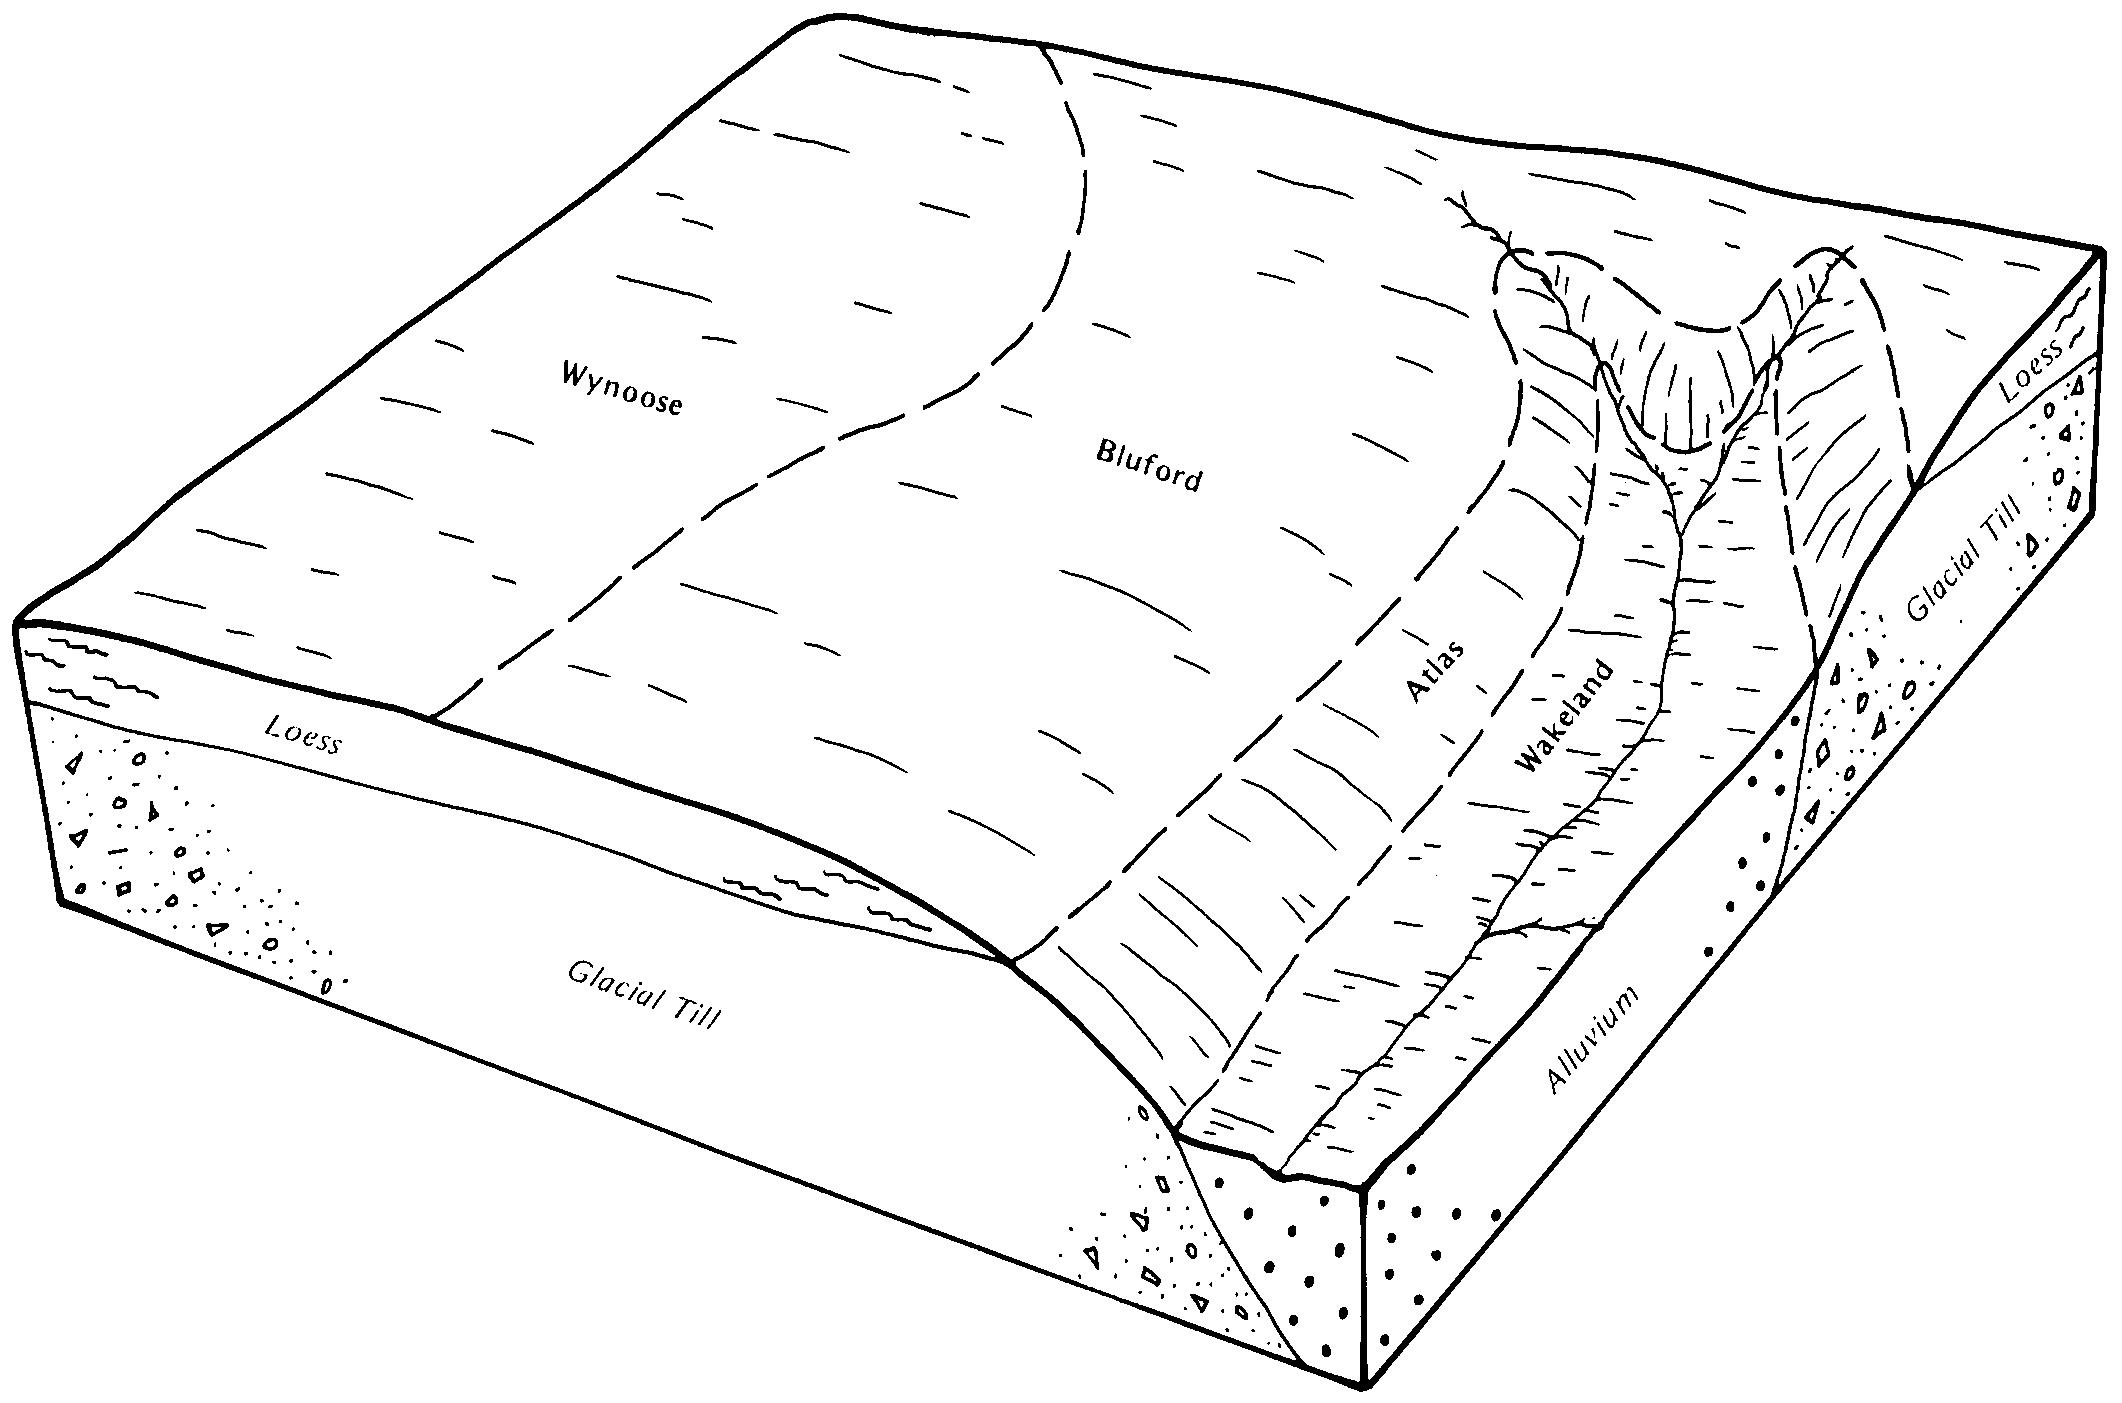 SoilWeb Soil Series Summary